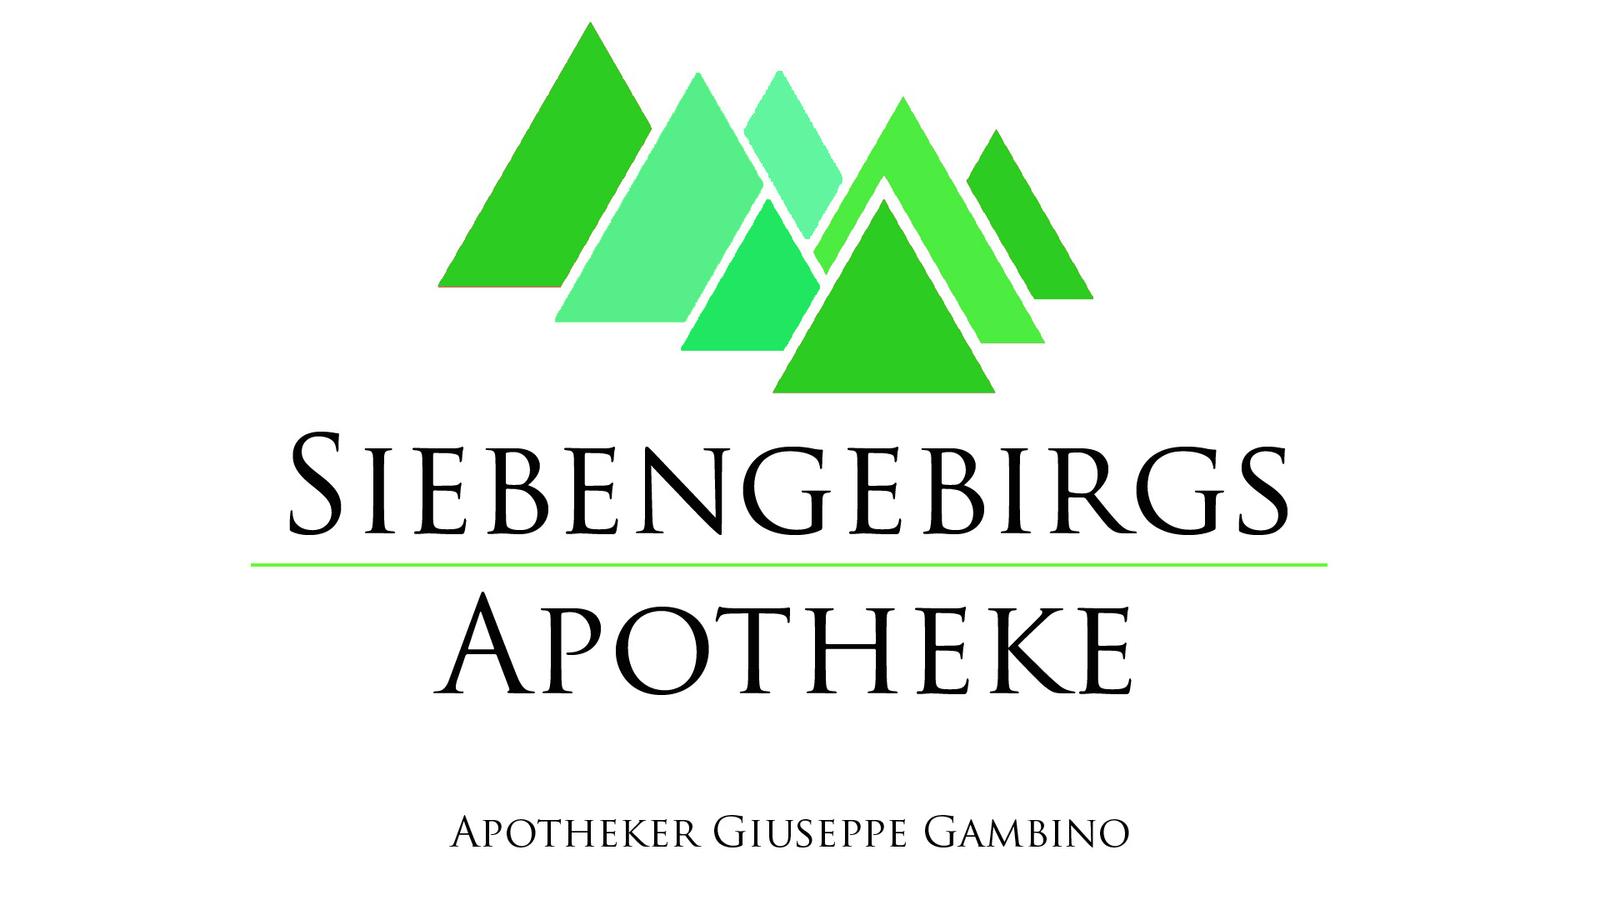 Logo der Siebengebirgs-Apotheke